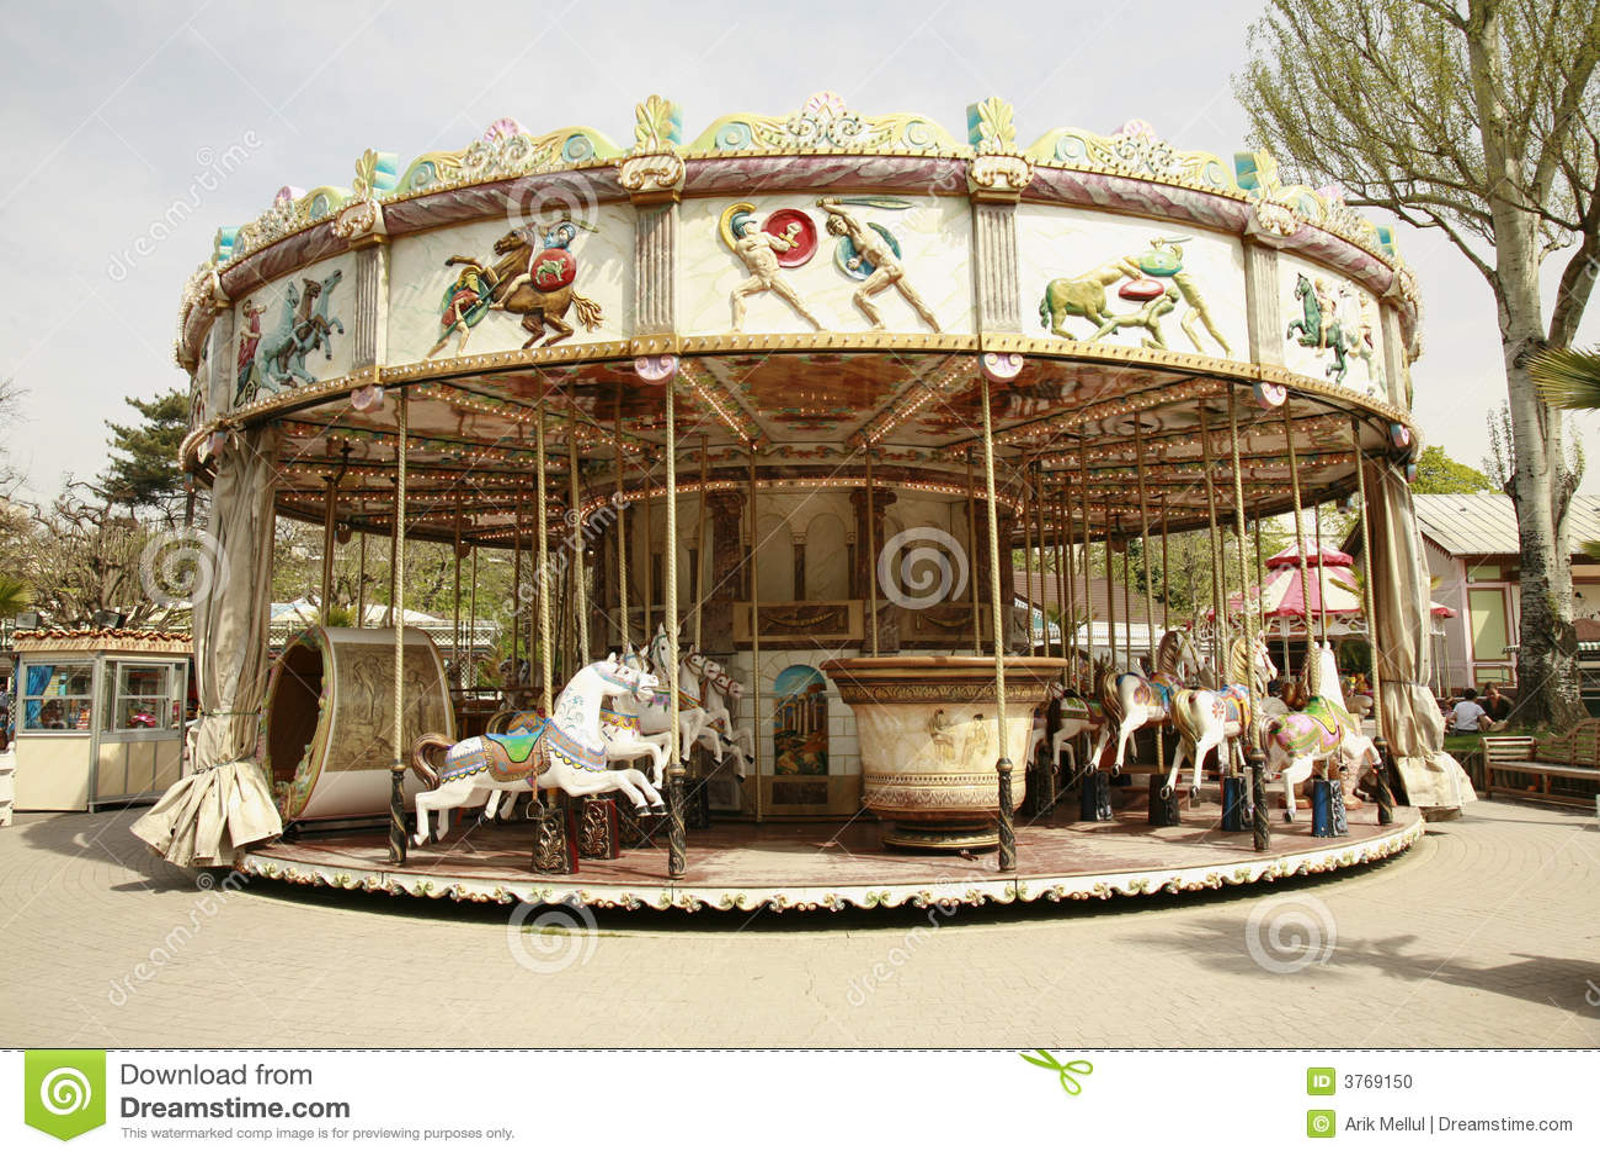 Vintage Carousel Ride Stock Photo - Image: 3769150